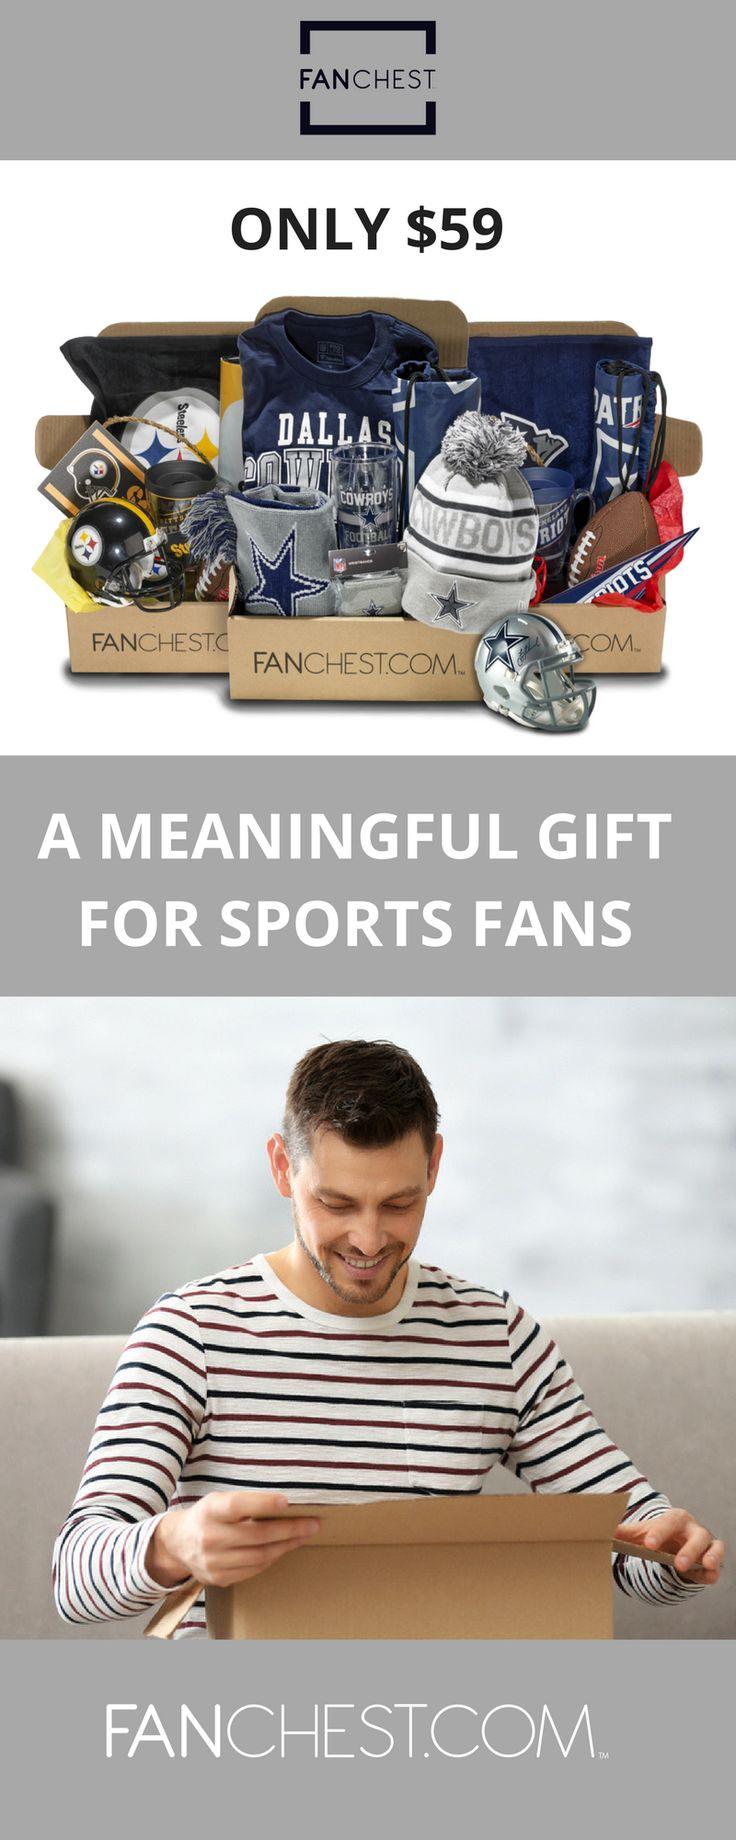 20 Best Dallas Cowboys Gift Ideas Images On Pinterest